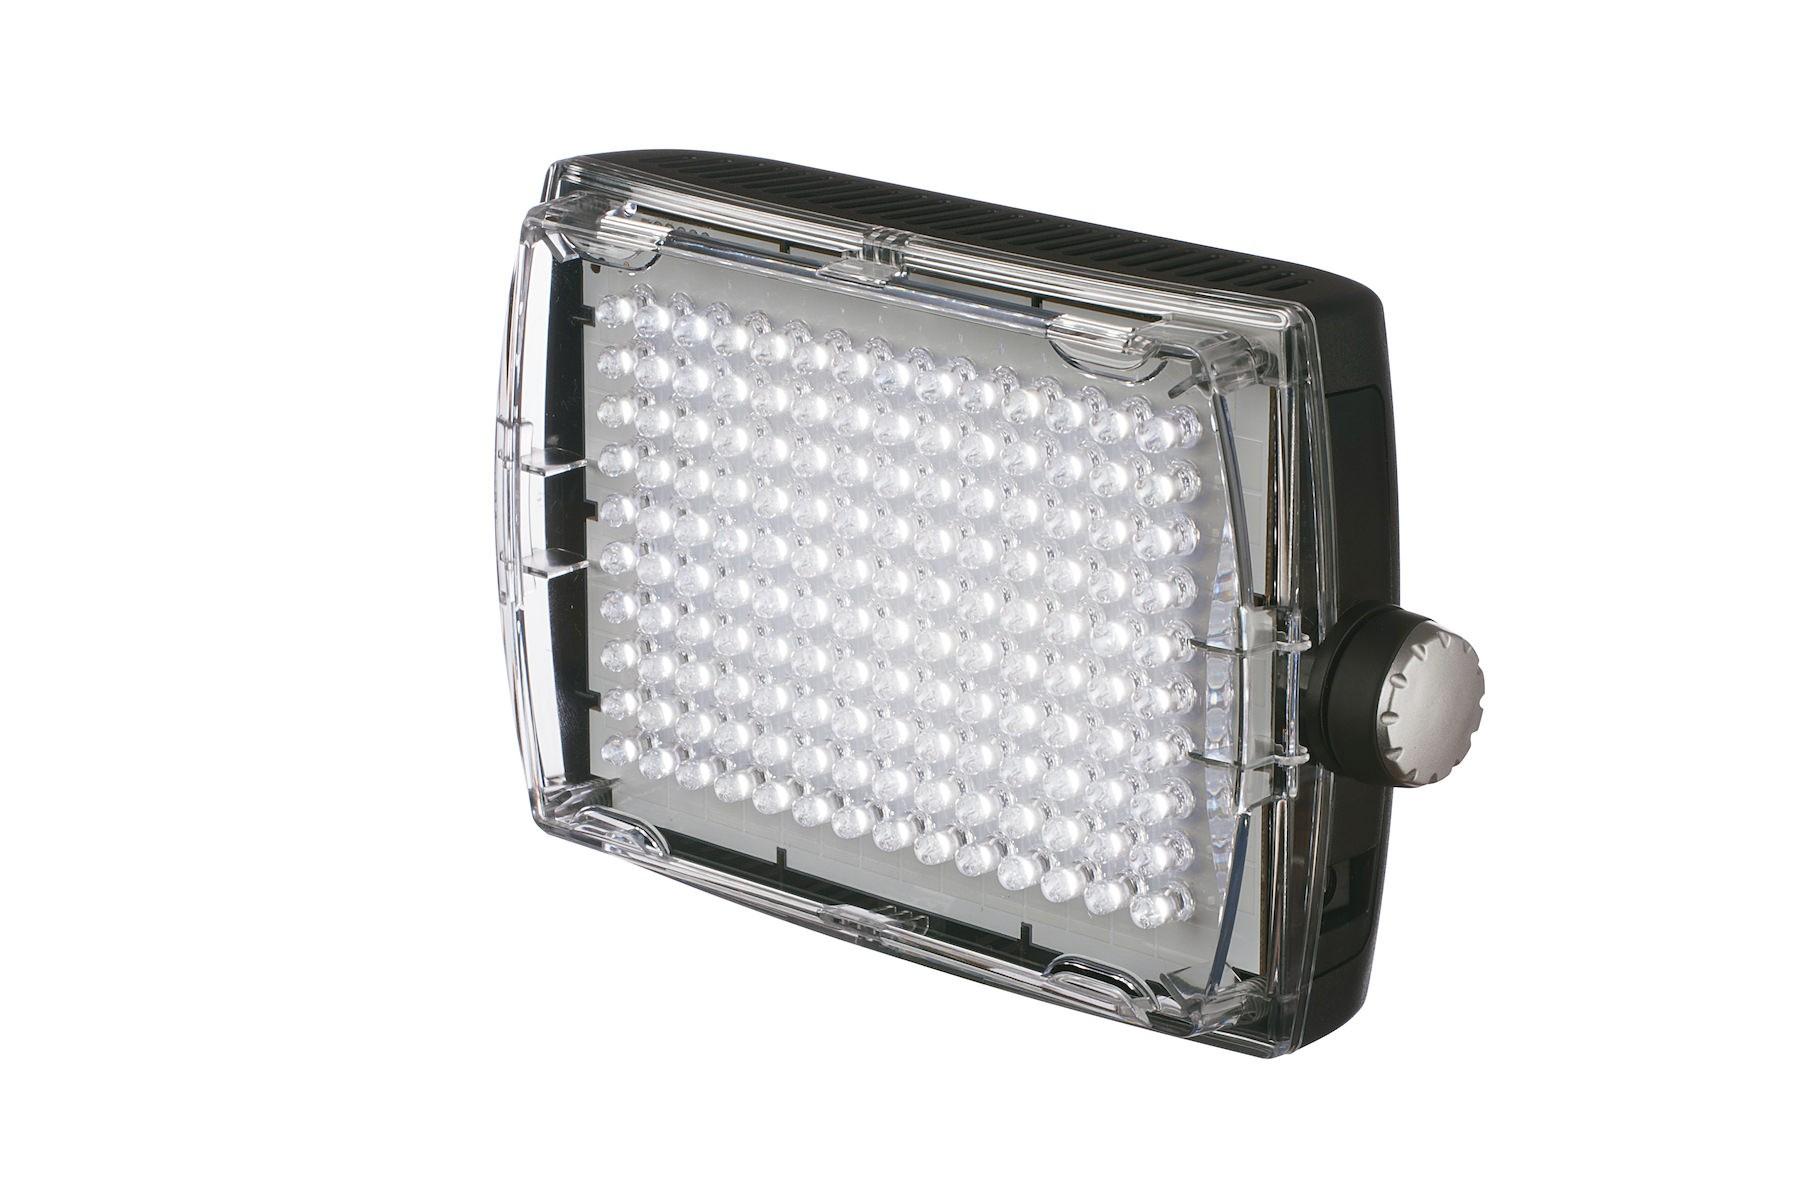 Spectra900F-LED Light-900lx@1m